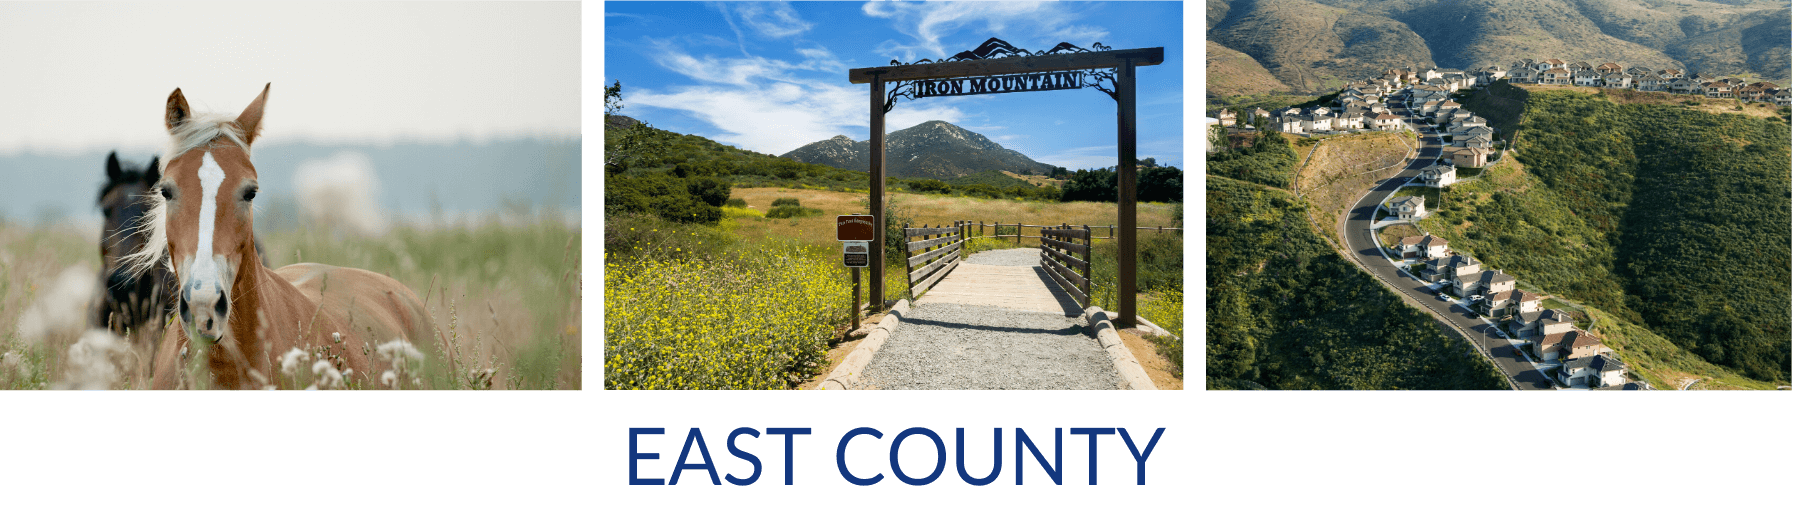 East County